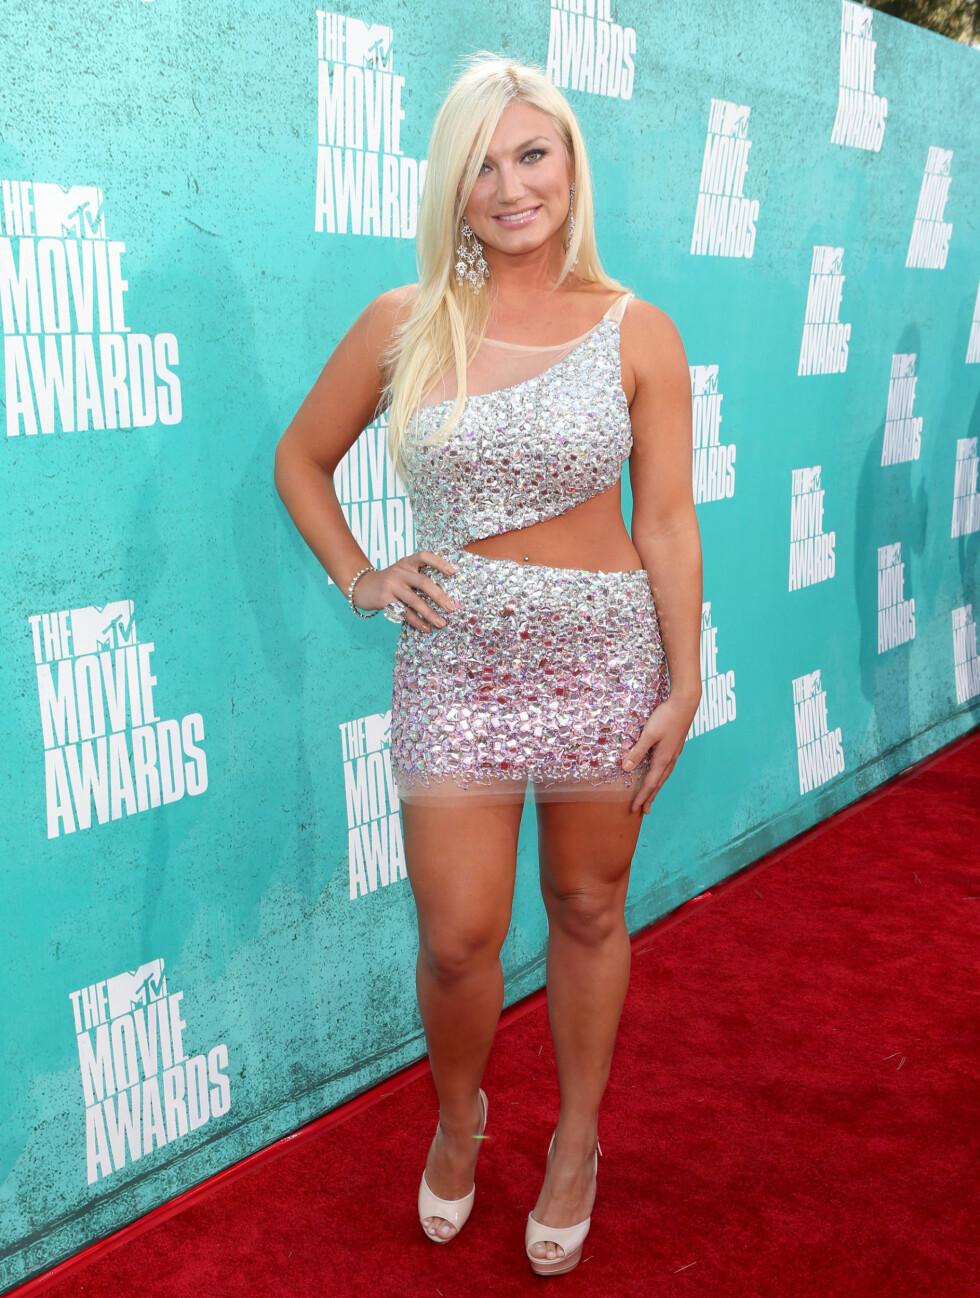 VÅGALT: TV-personlighet Brooke Hogan i en kjole av det mer vågale slaget på nattens MTV Movie Awards. Foto: All Over Press